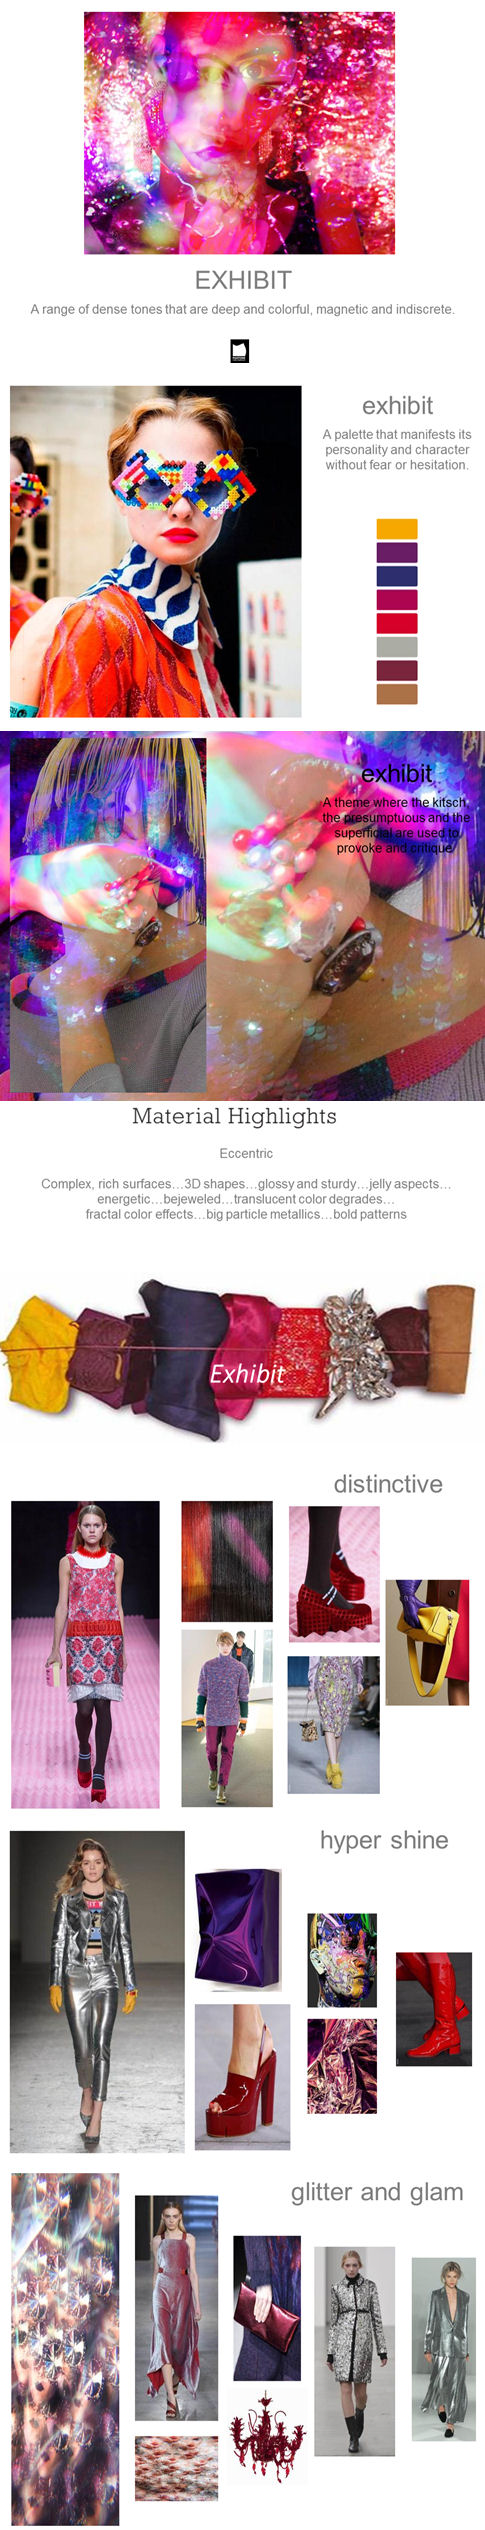 tuesday trending: pantone a/w 16/17 | @meccinteriors | design bites